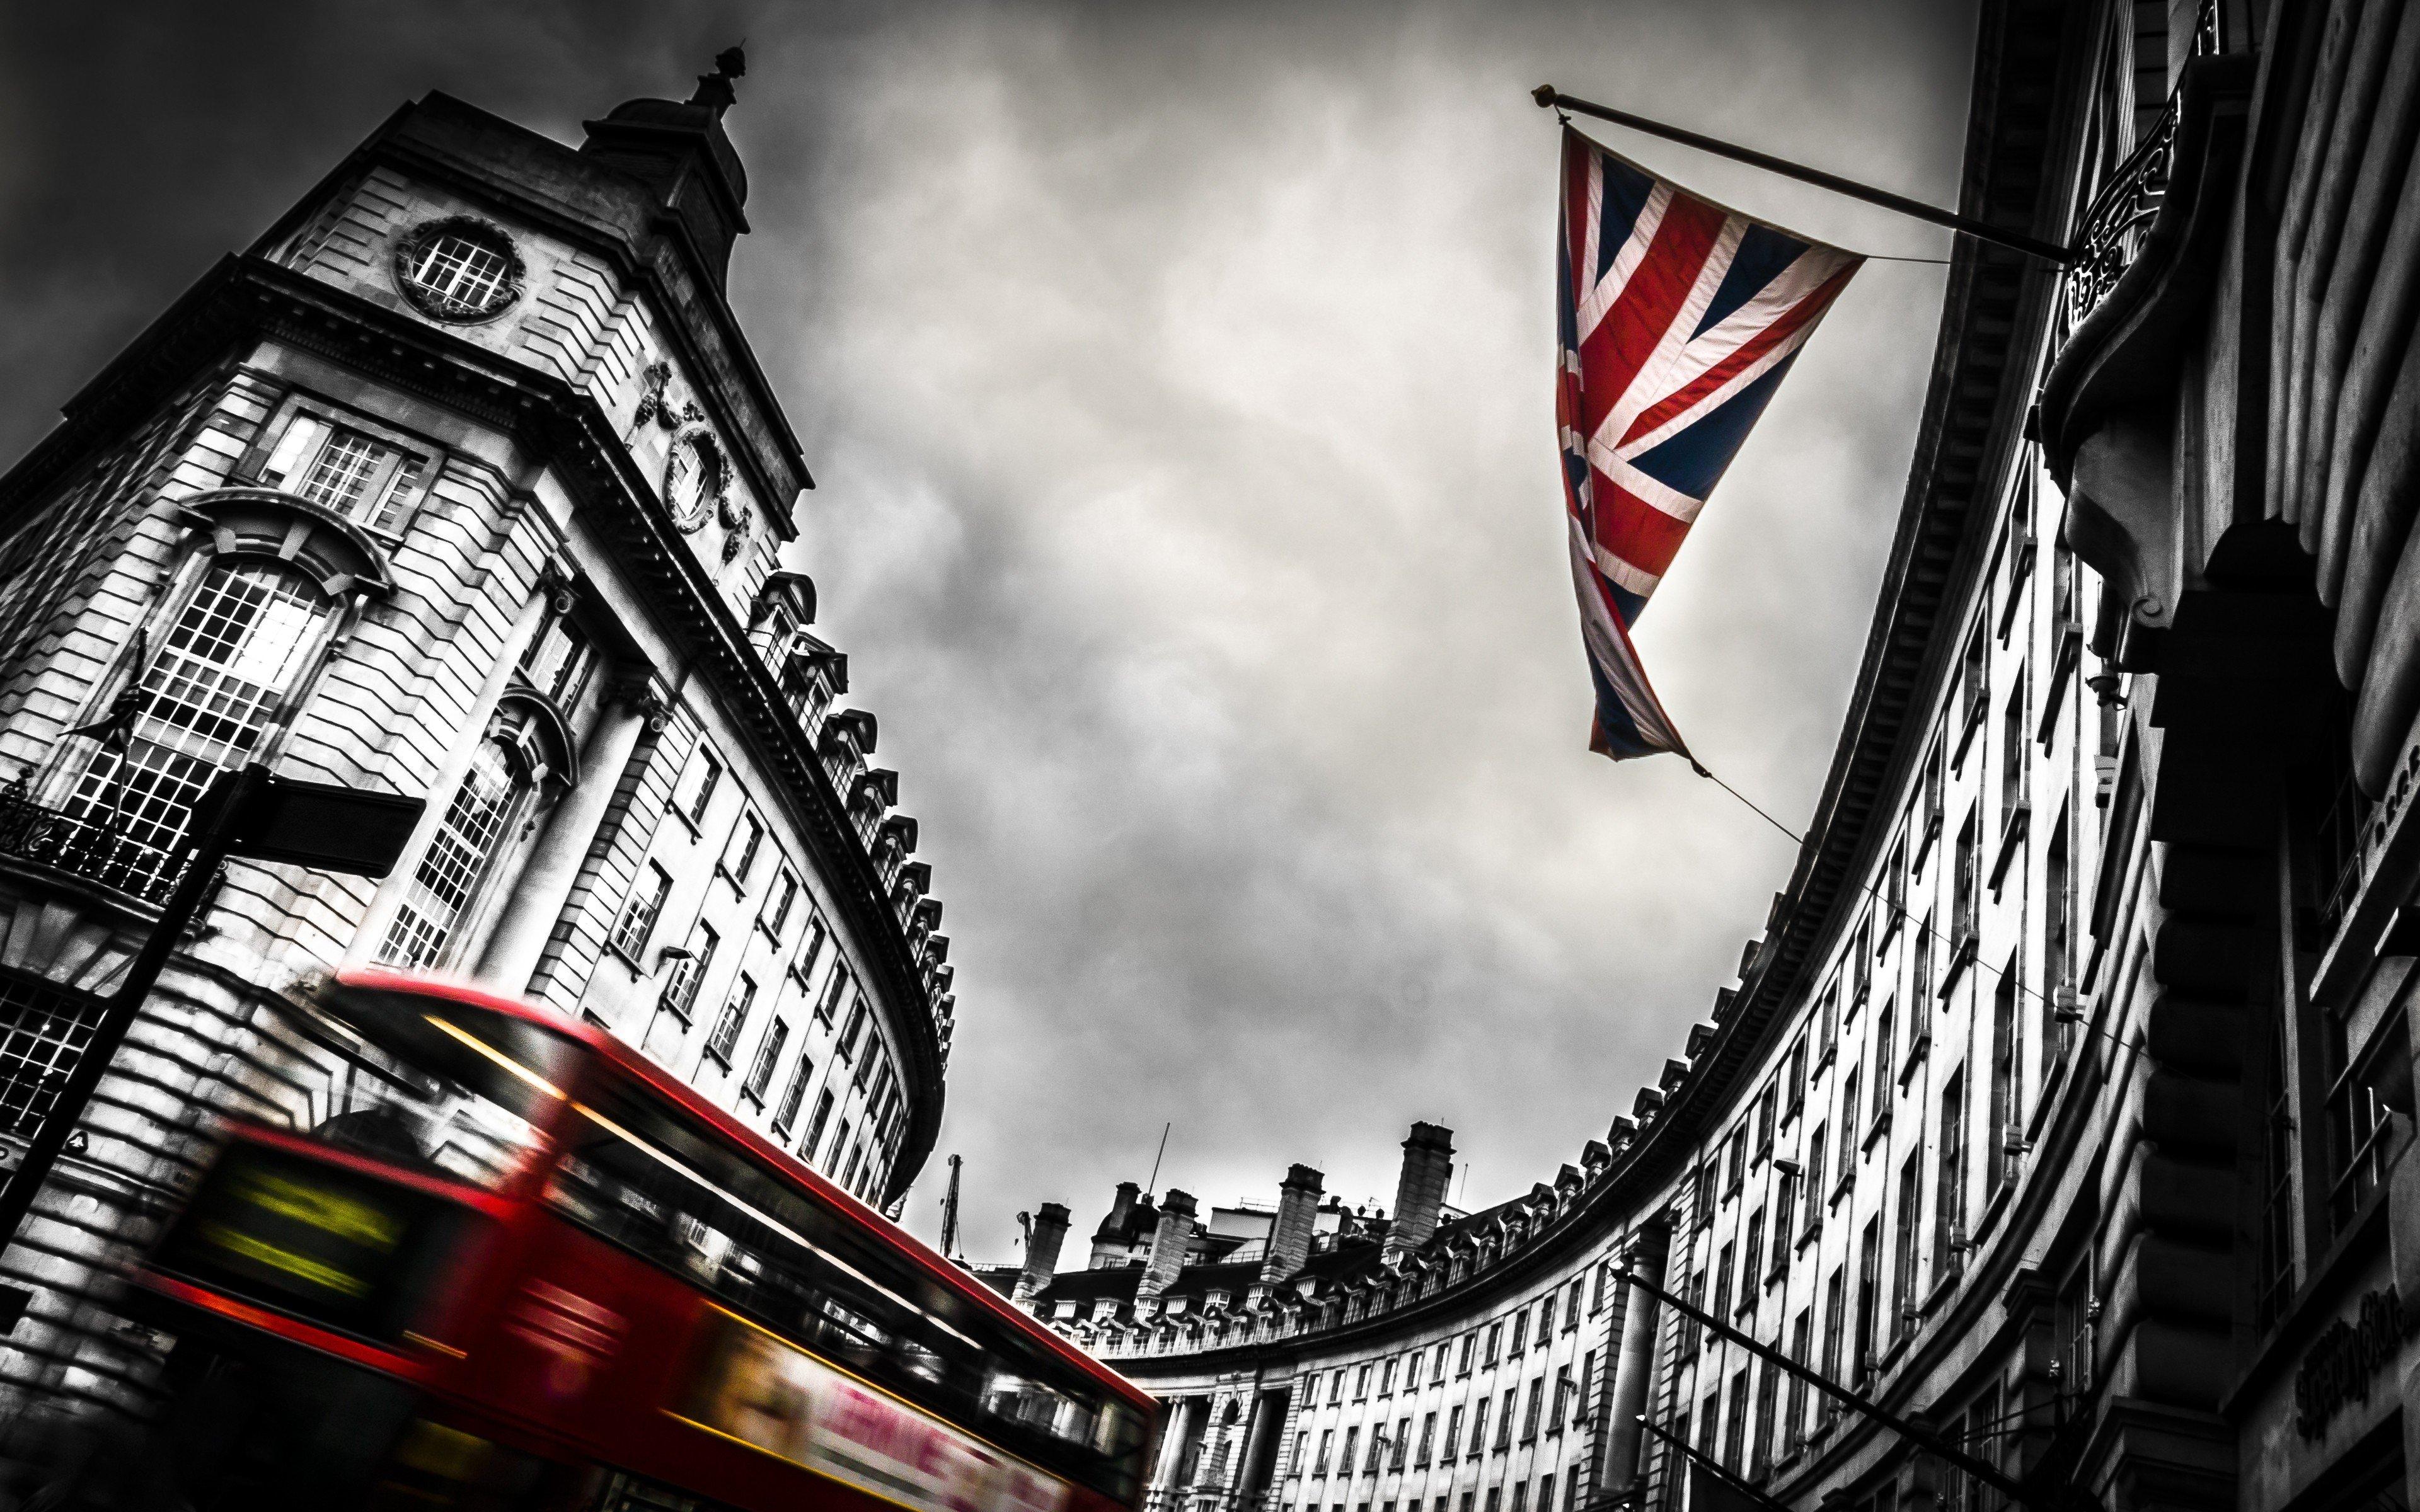 Красивые картинки с флагом англии